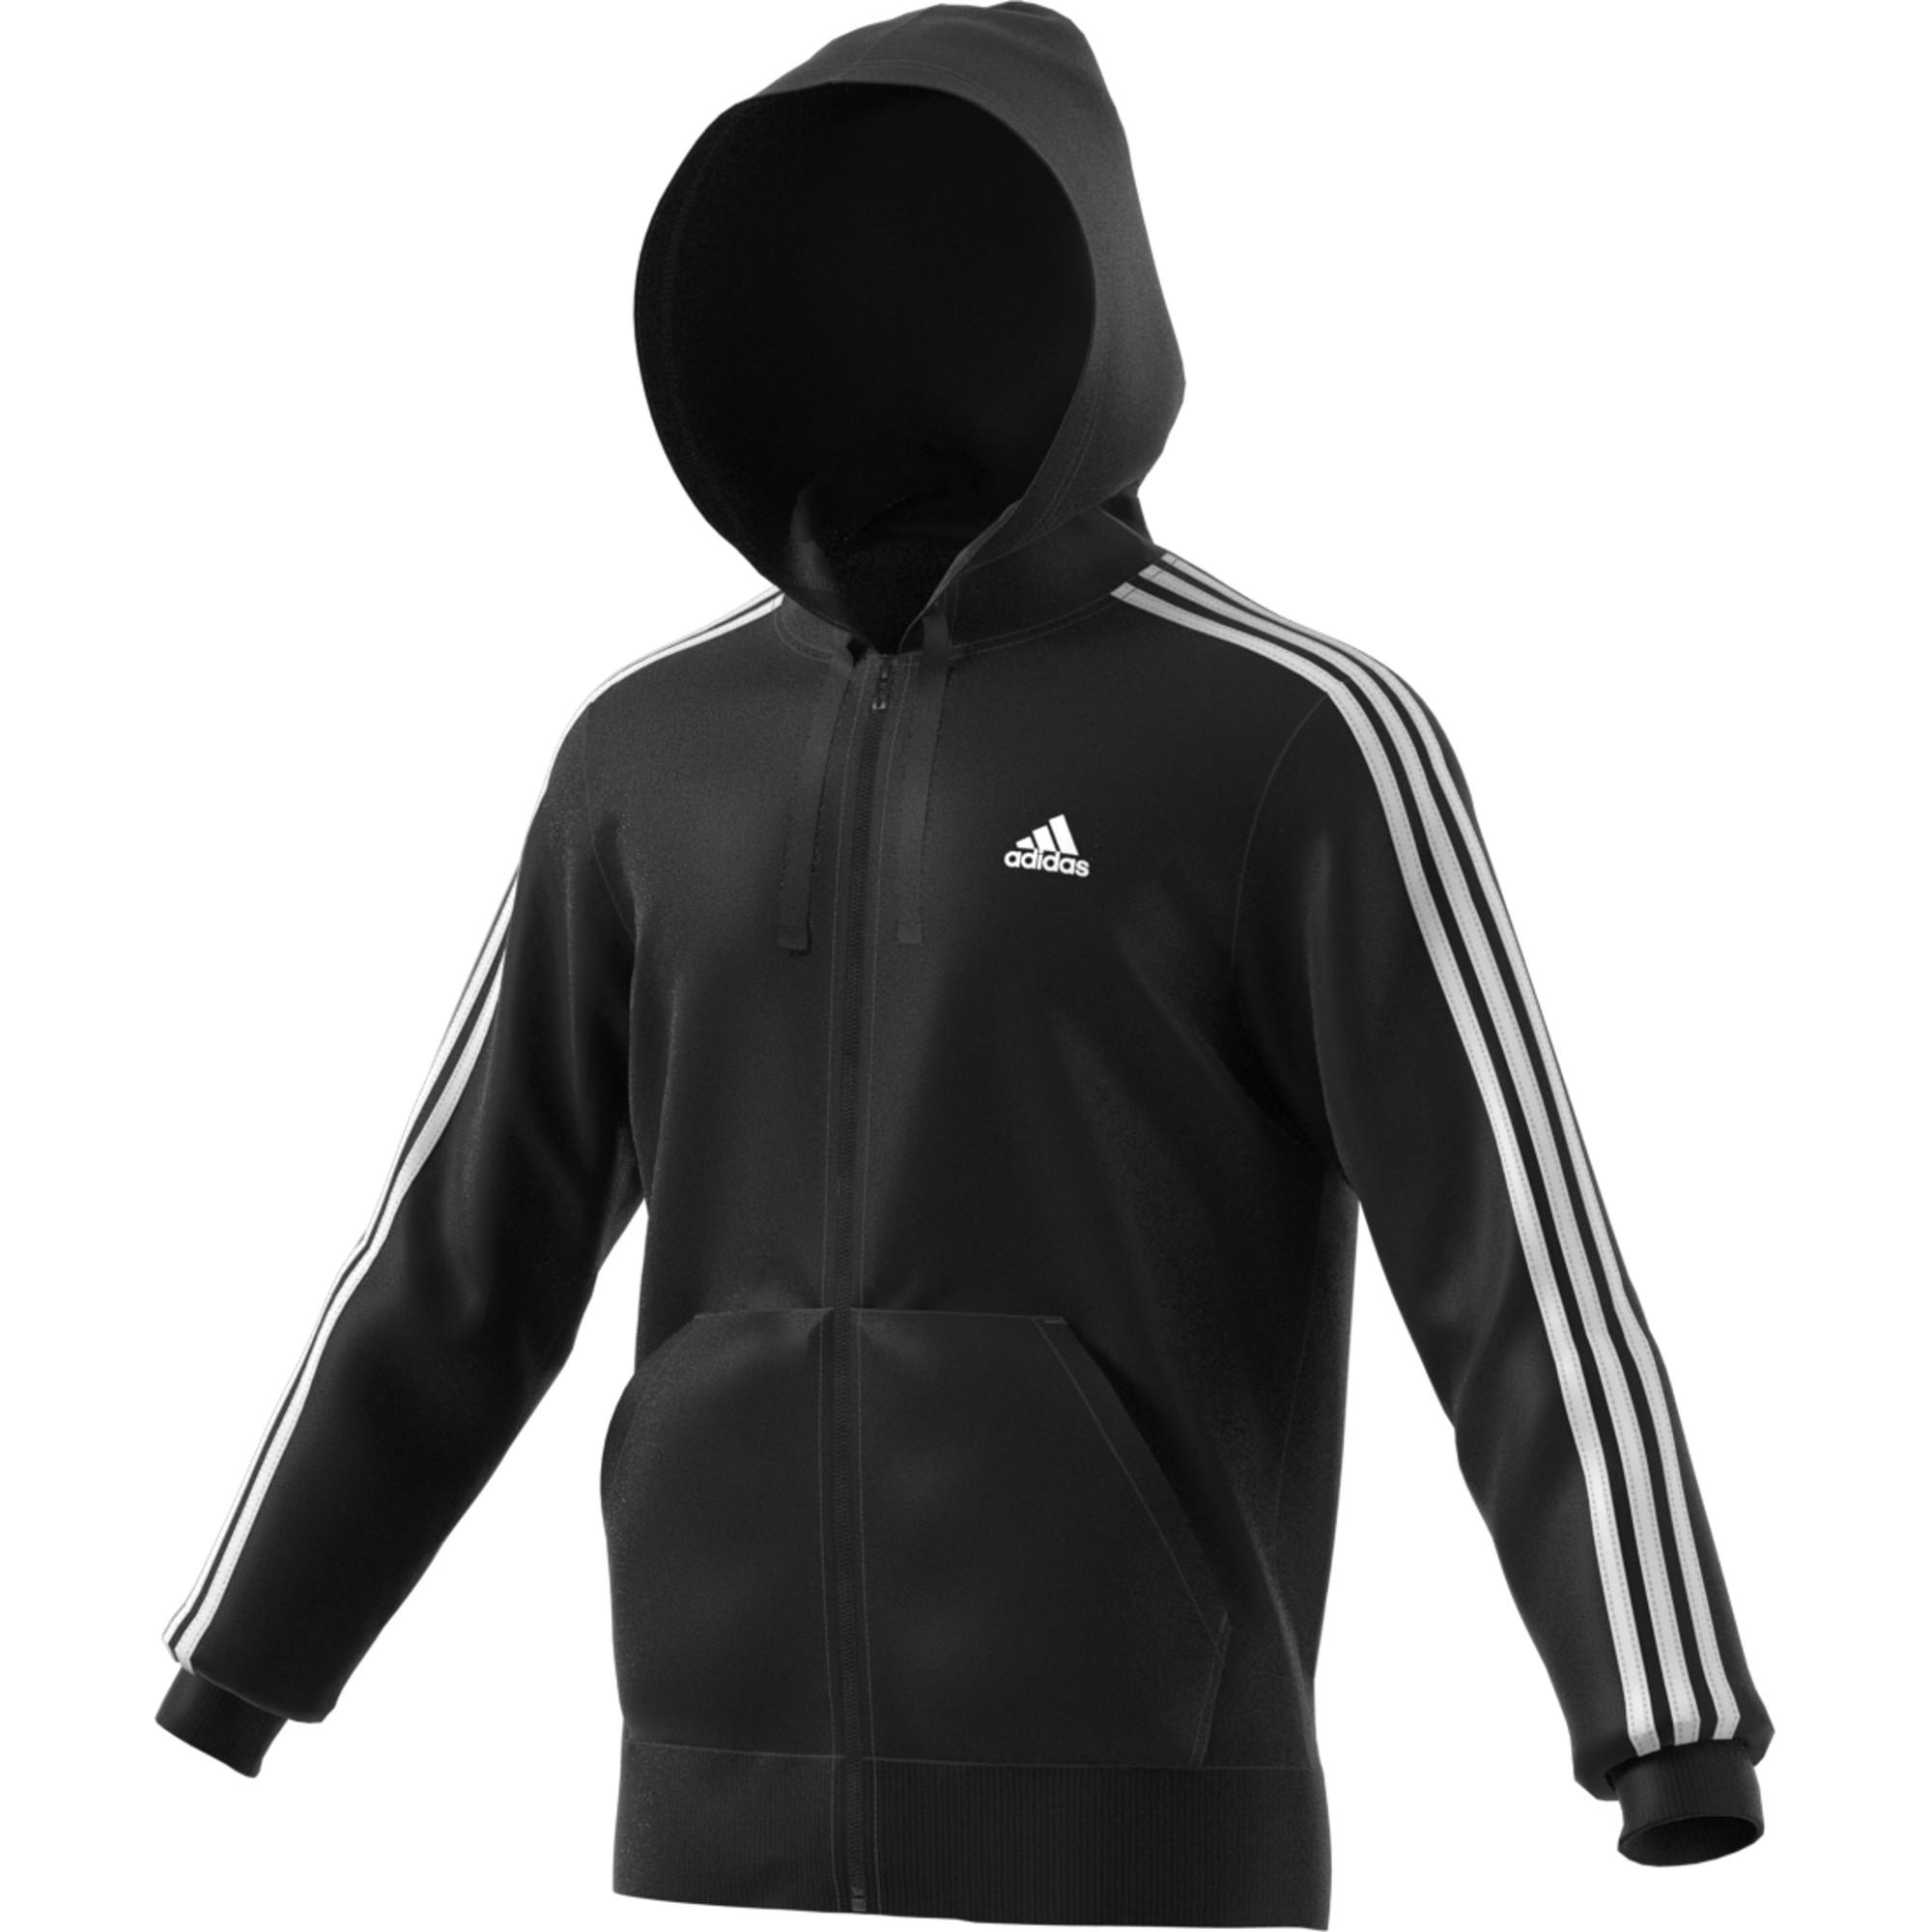 9c357bfe38f adidas Essentials 3 Stripes Full-Zip Hood - Sweatshirts / Hoodies for Men -  Black | 21RUN